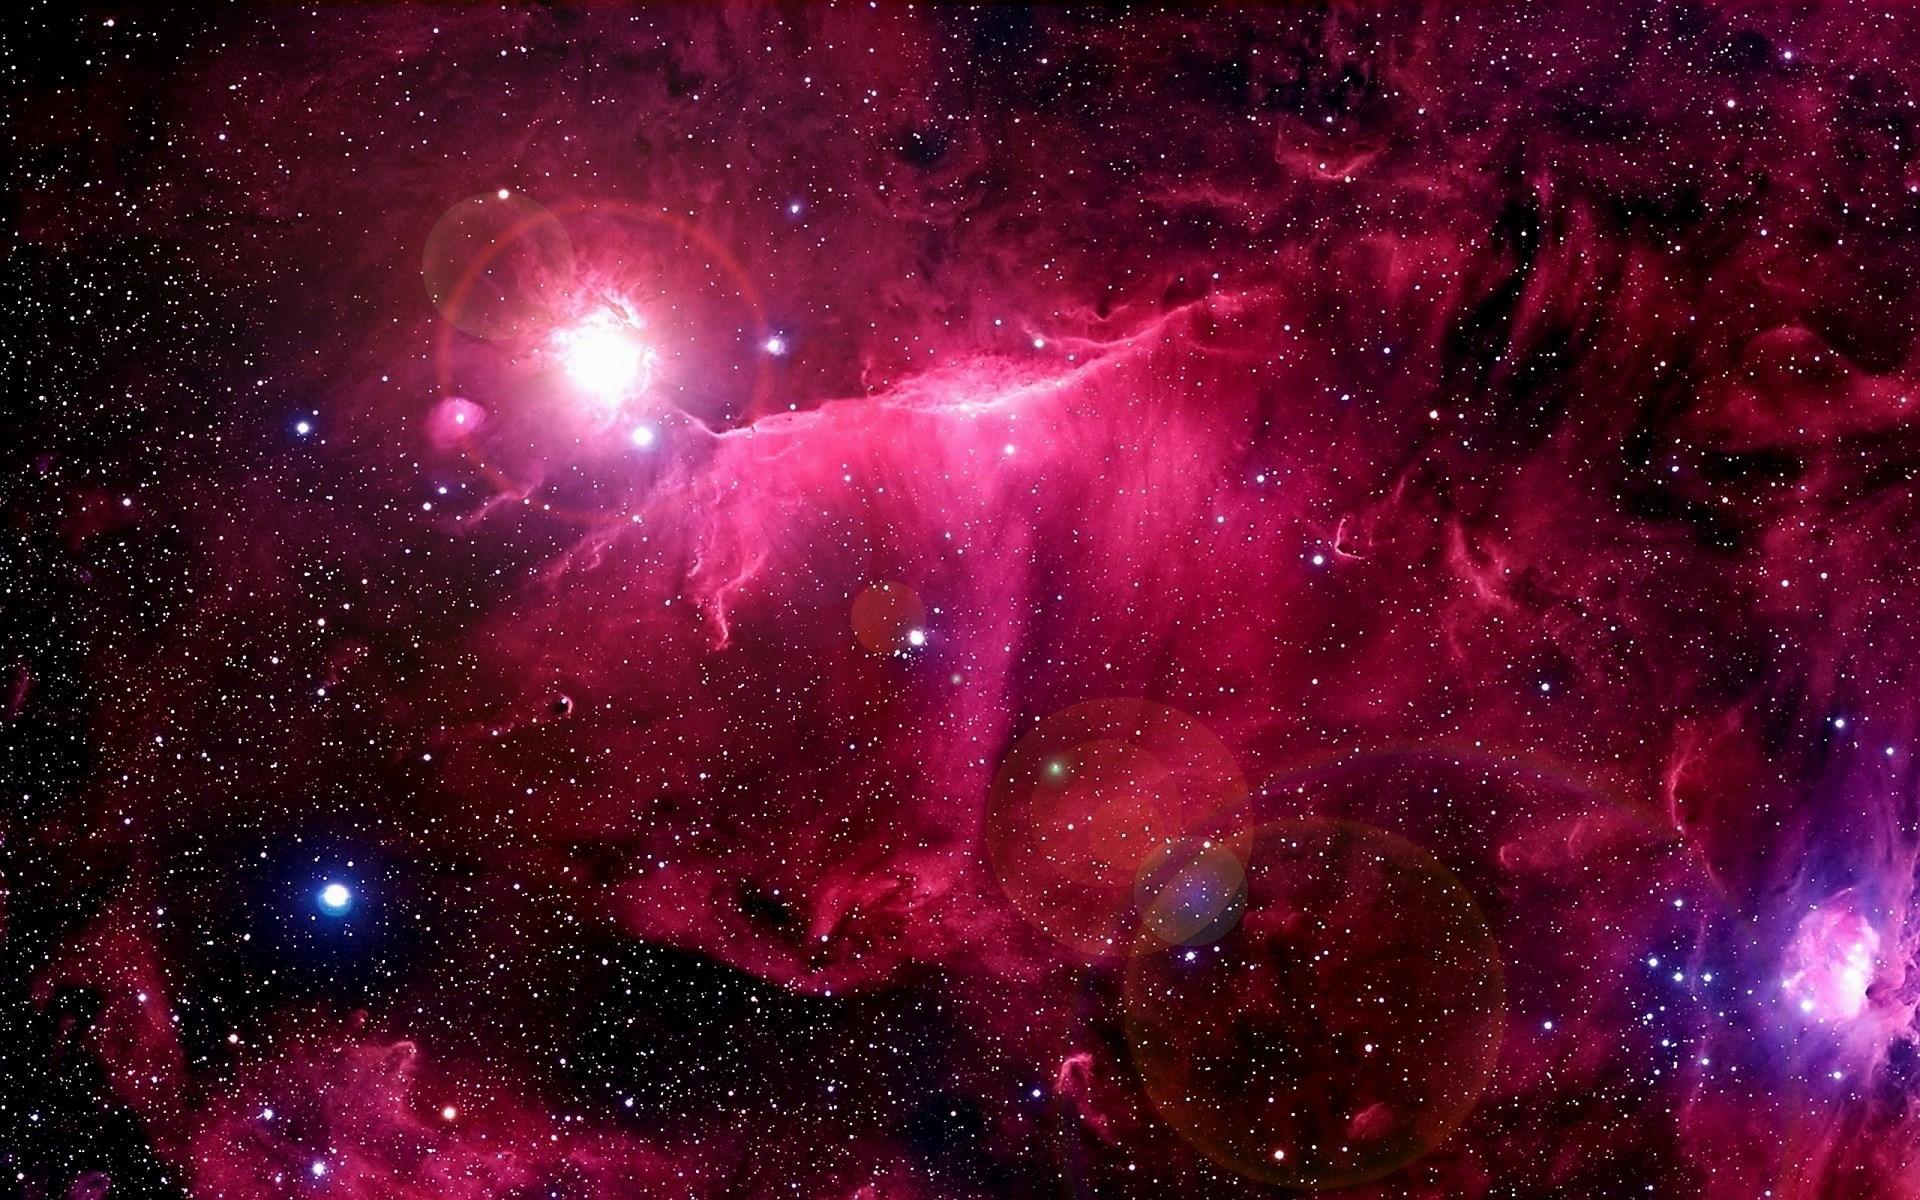 … cool galaxy wallpapers hdwallpaper20 com …